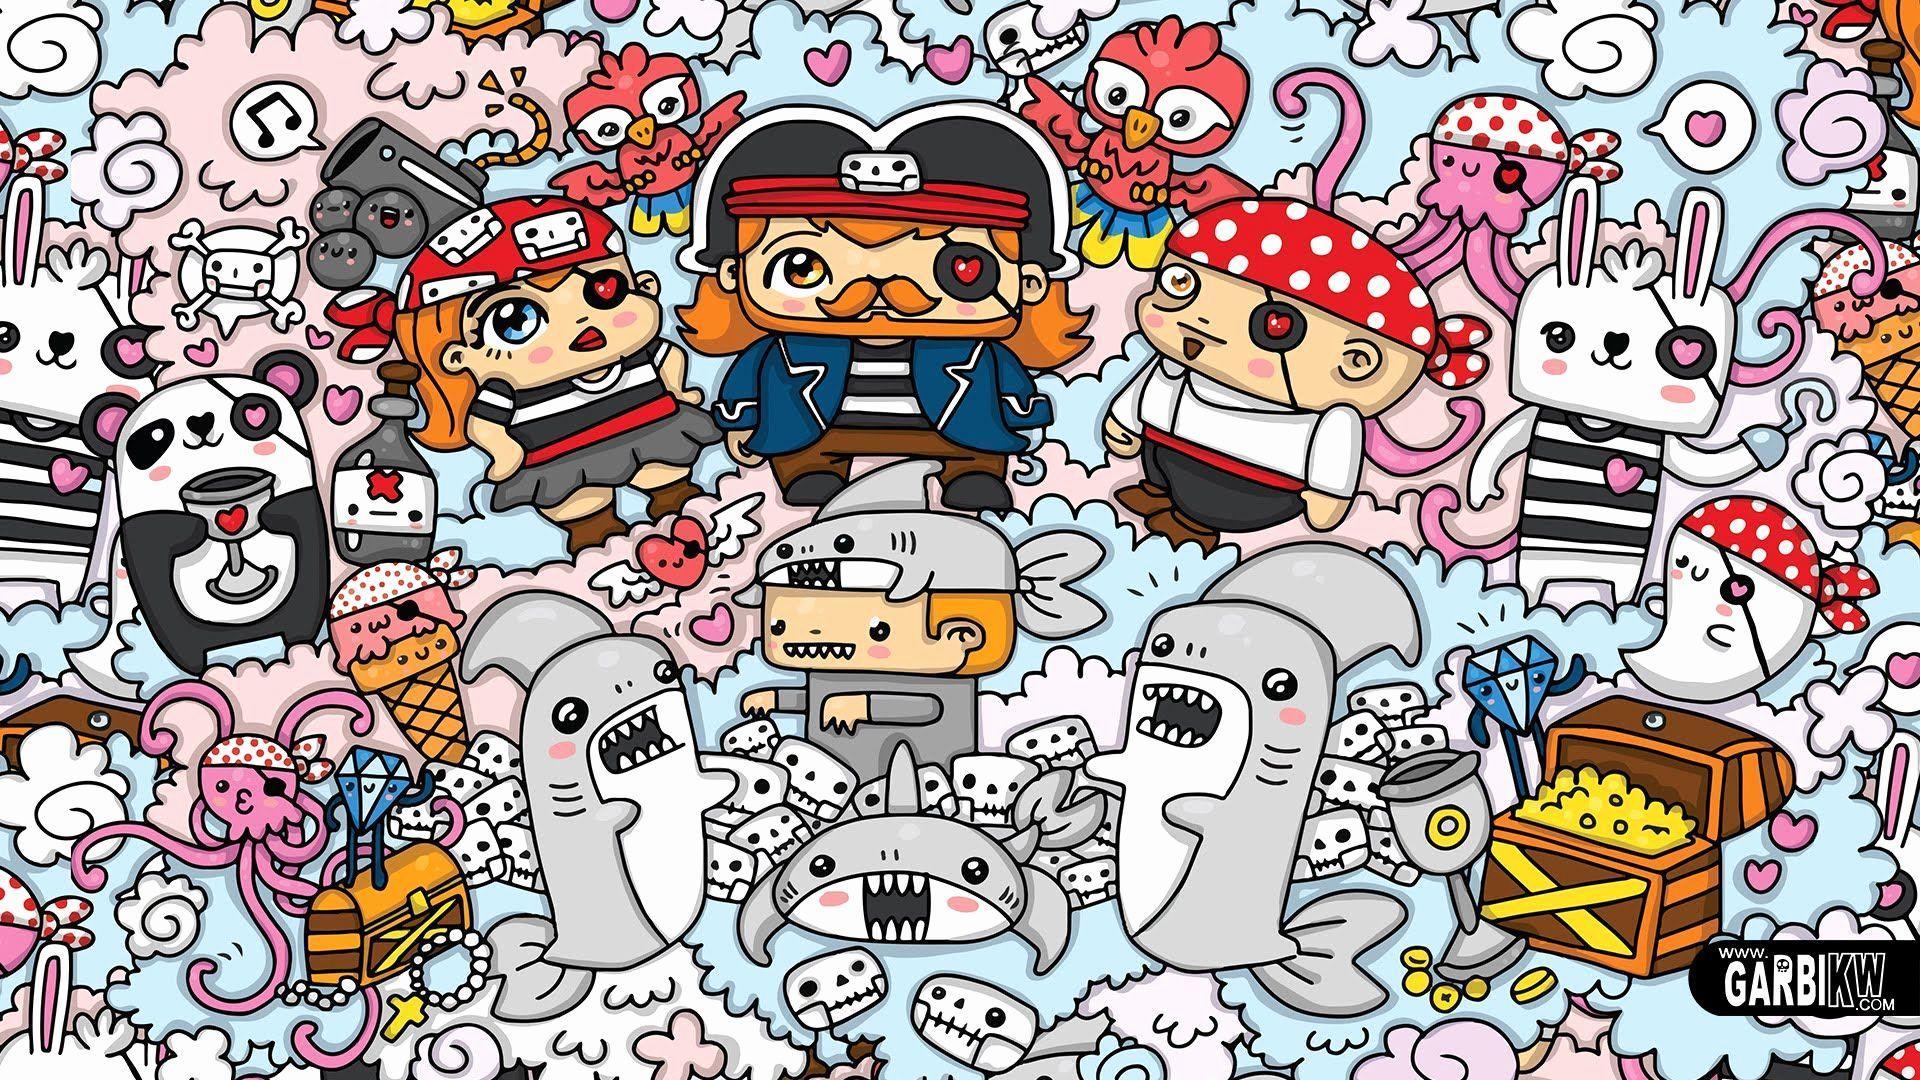 doodles cute graffiti kawaii doodle wallpapers garbi draw kw pirates drawings drawing doodling lgbt